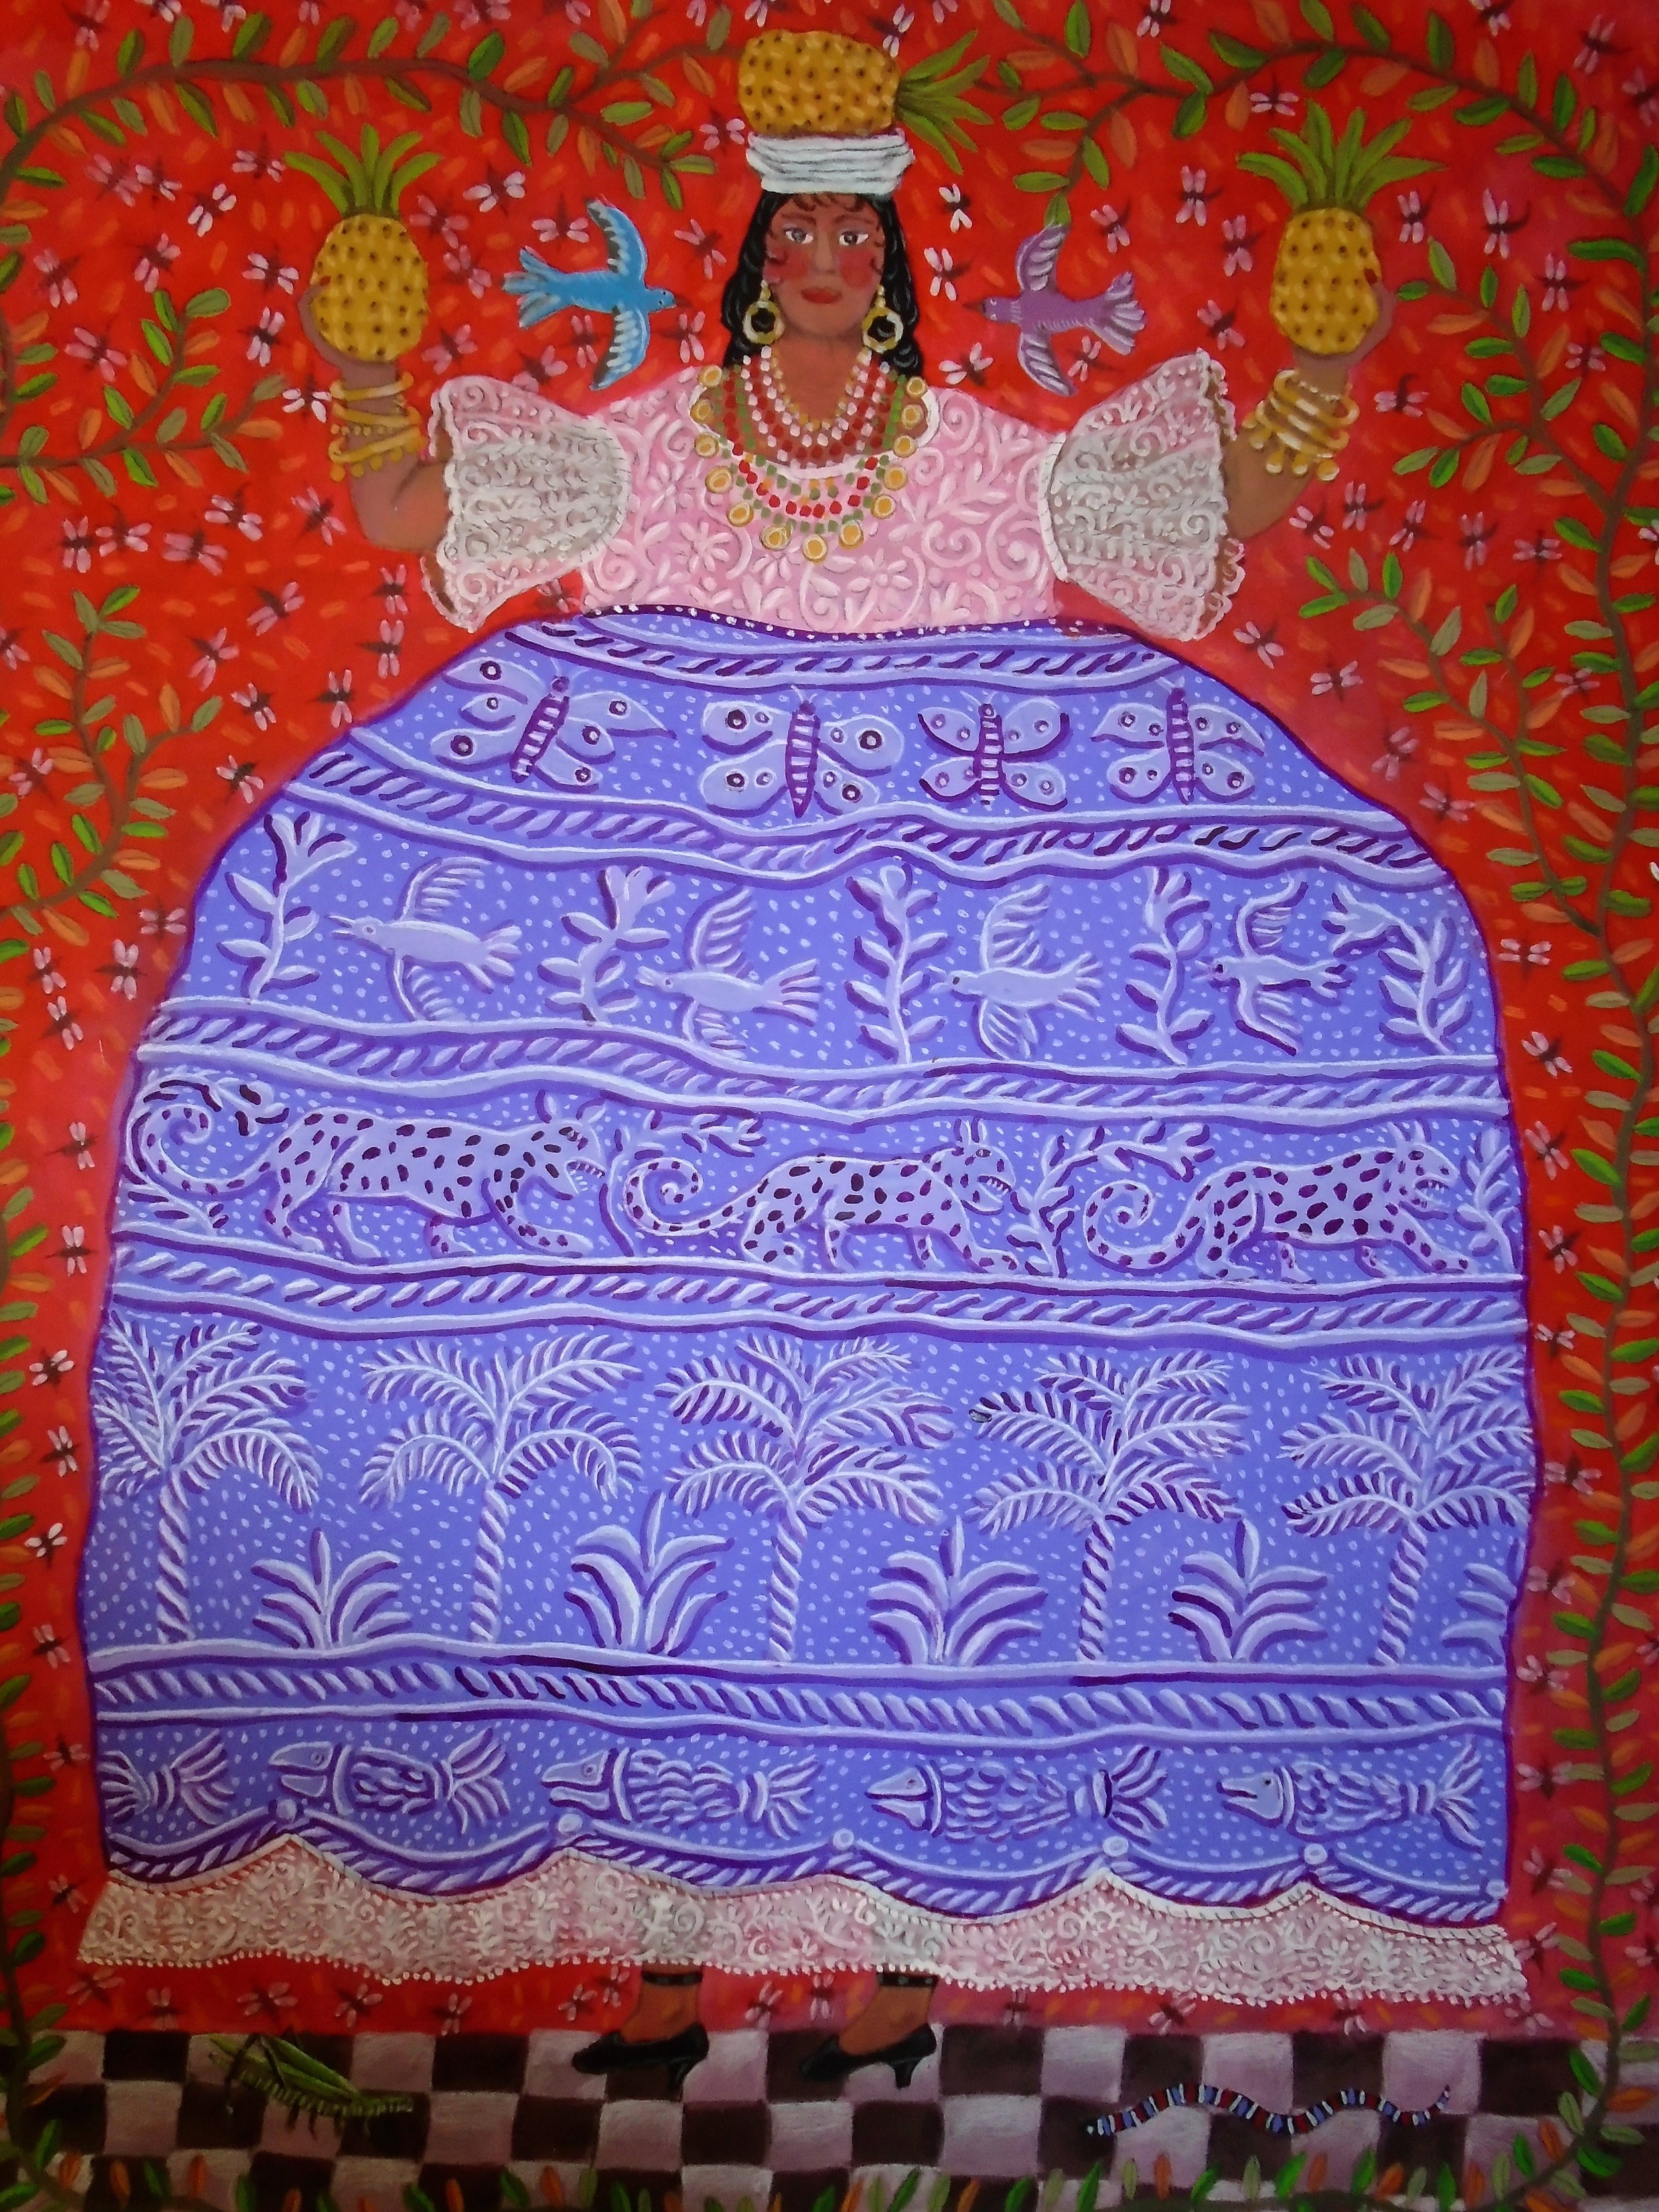 danza de las piñas.,(tehuana).1.00x1.30mts.(40inchs.x51inchs.) 002.jpg